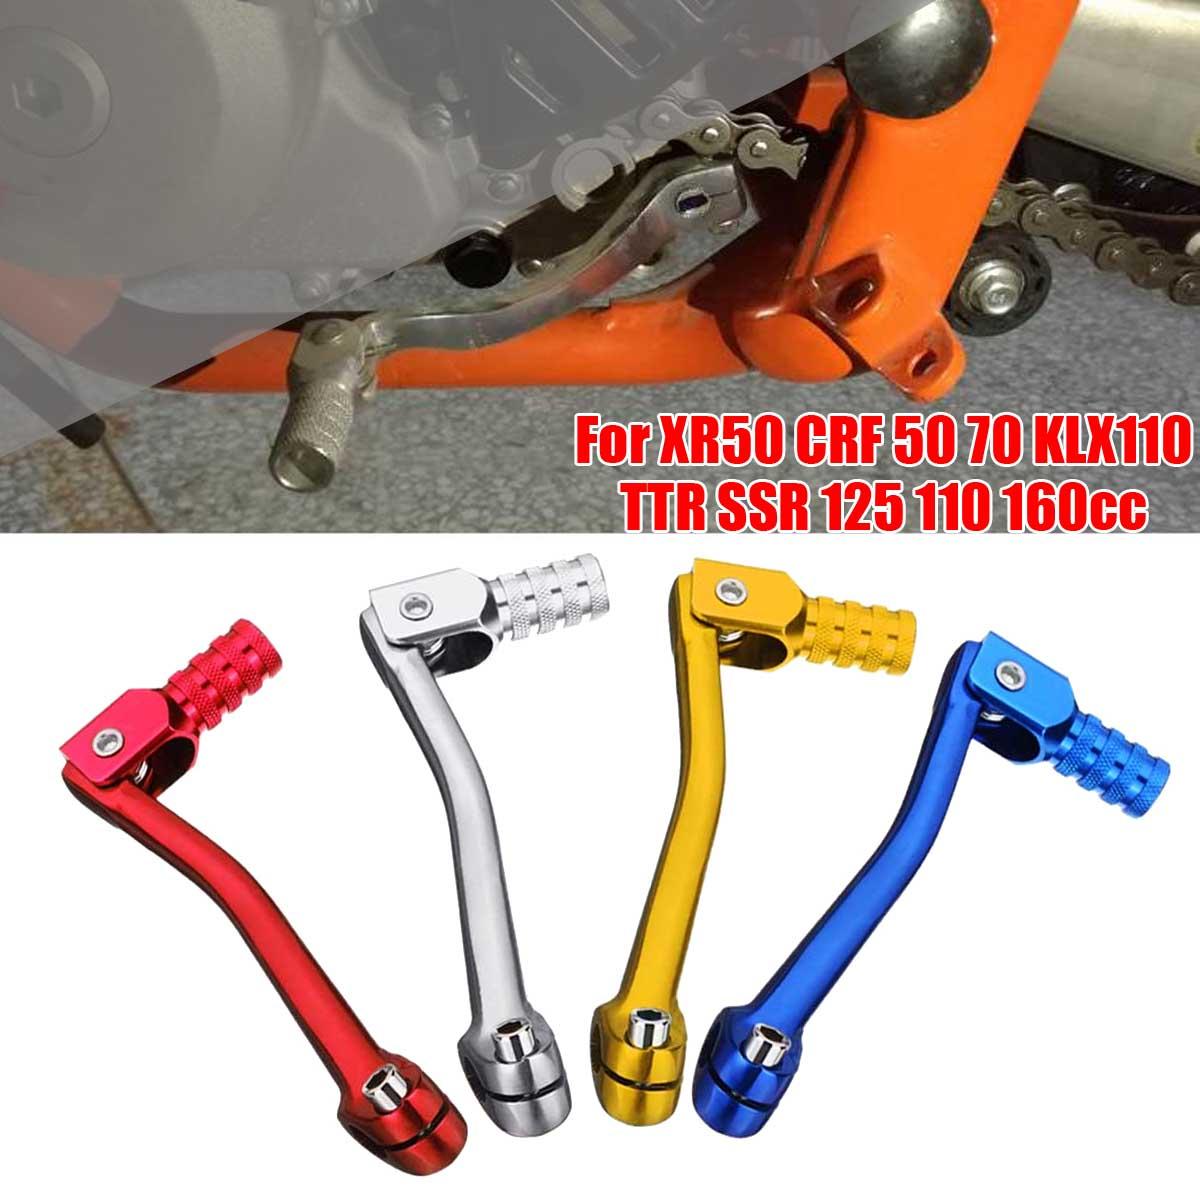 CNC Gear Shifter Lever For XR50 CRF 50 70 KLX110 SSR 110-160cc Pit Dirt Bike PRO